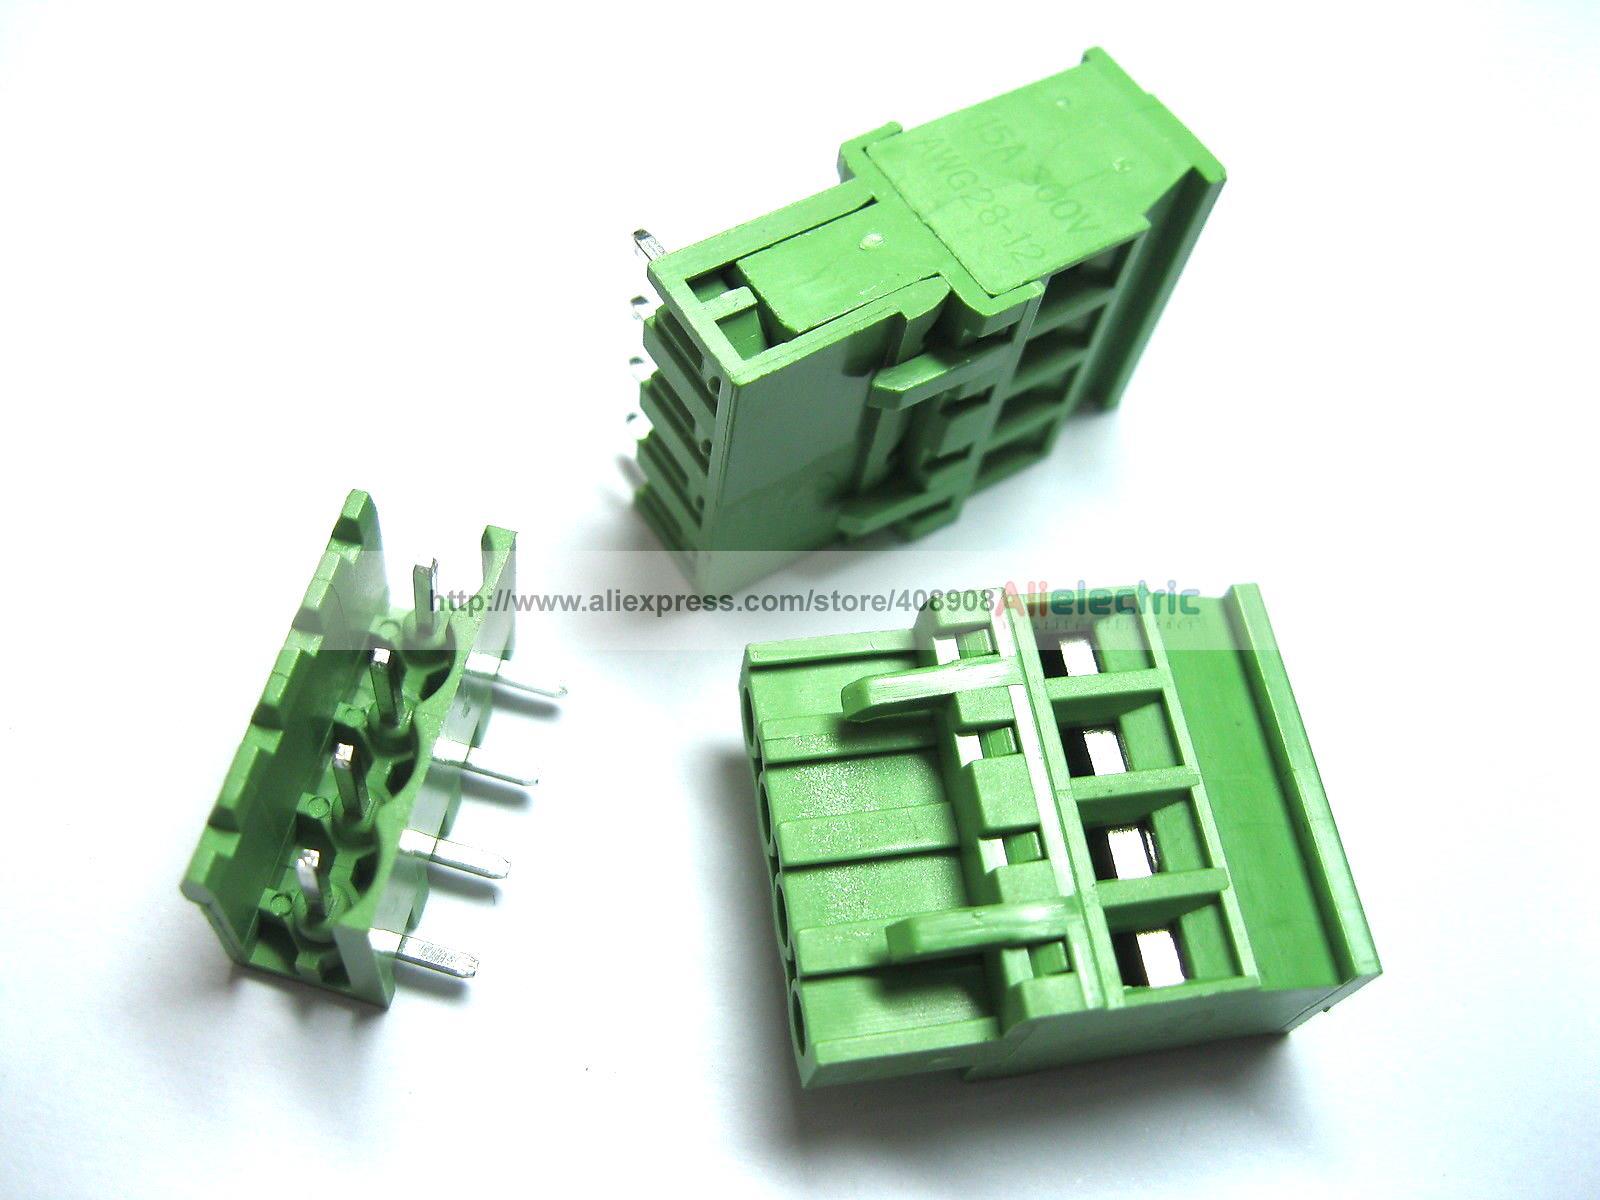 40 Pcs 5.08A 5.08mm Angle 4 Pin Screw Terminal Block Connector Pluggable Type 50 pcs 5 08mm angle 6 pin screw terminal block connector pluggable type green